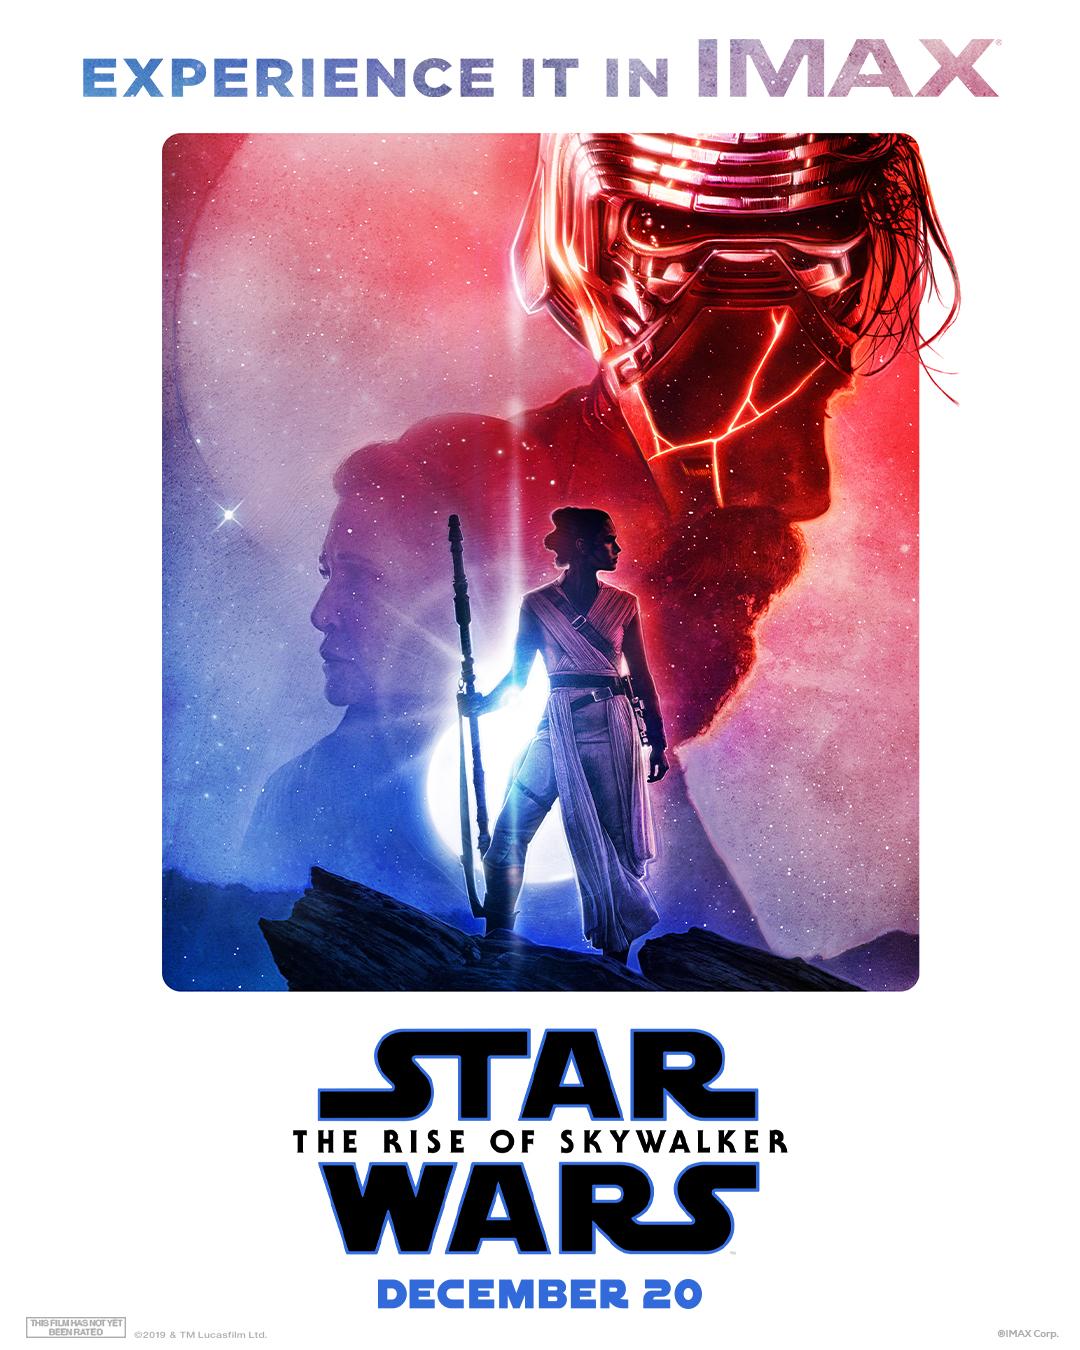 Póster IMAX de Star Wars: The Rise of Skywalker (2019). Imagen: IMAX Twitter (@IMAX).